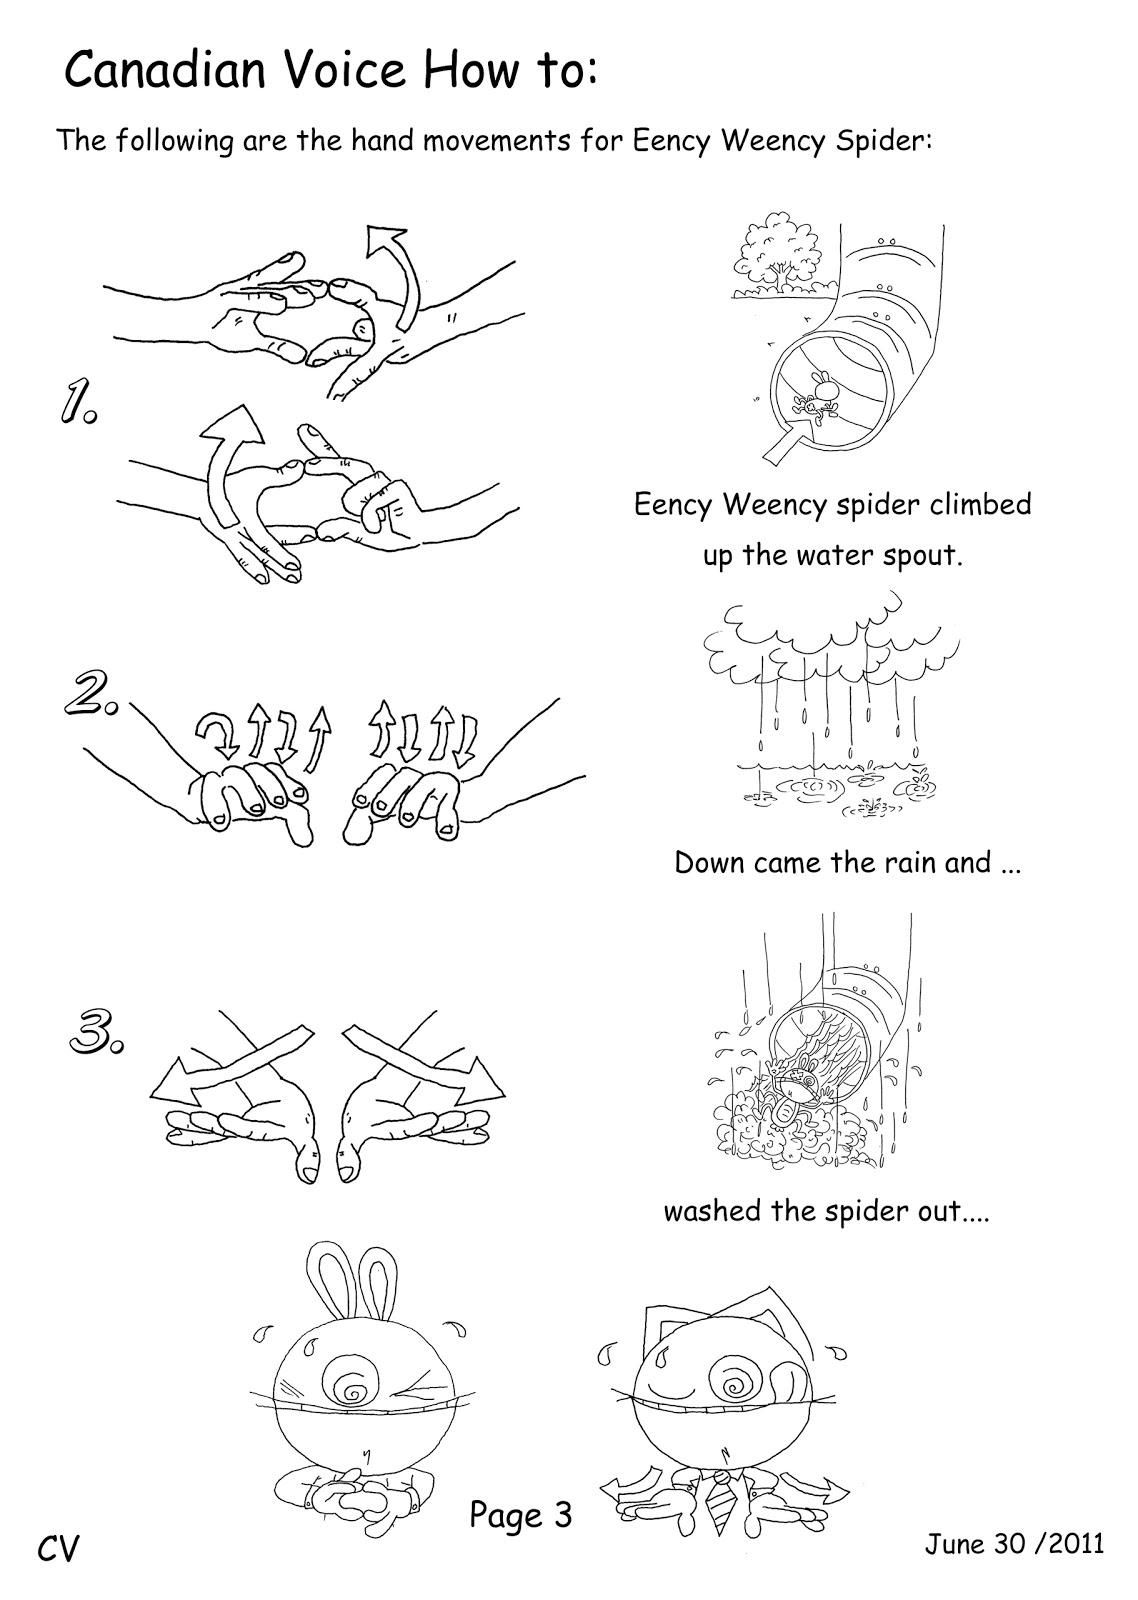 Canadian Voice English School Nagano Eency Weency Spider